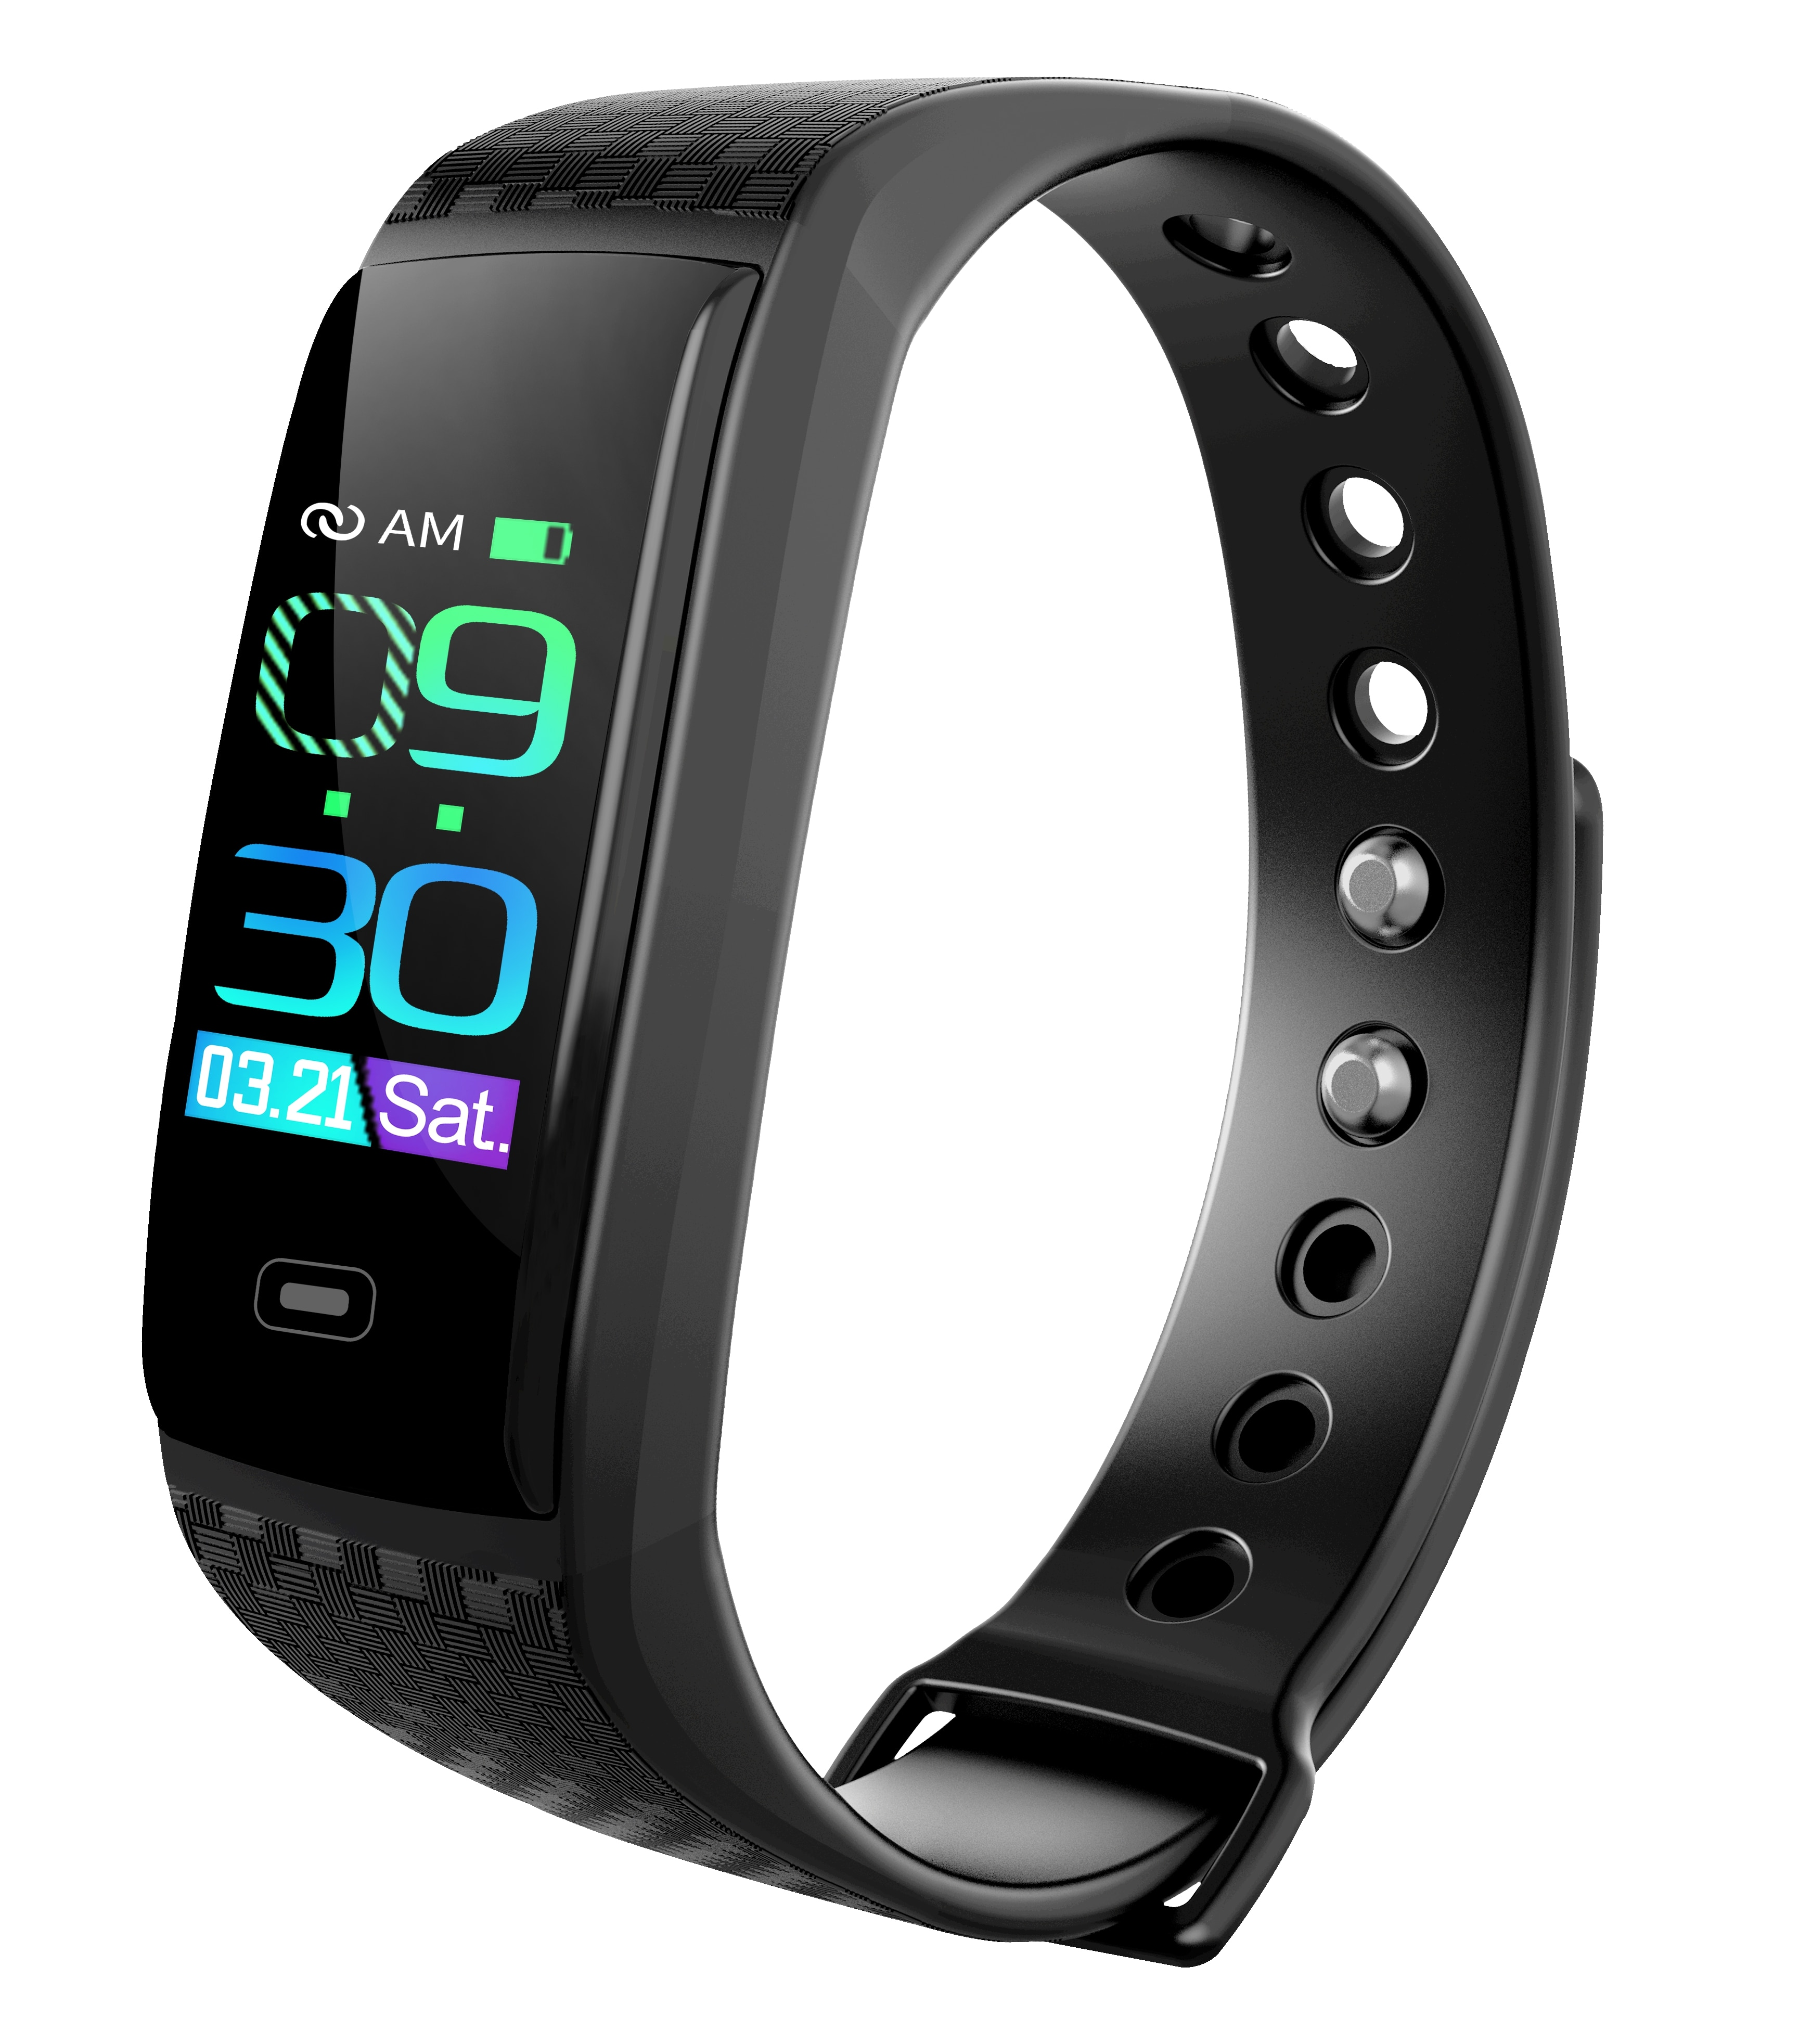 Reloj inteligente deportivo actividad de Fitness rastreador de ritmo cardíaco pulsera de presión arterial podómetro Smartband impermeable para IOS Android